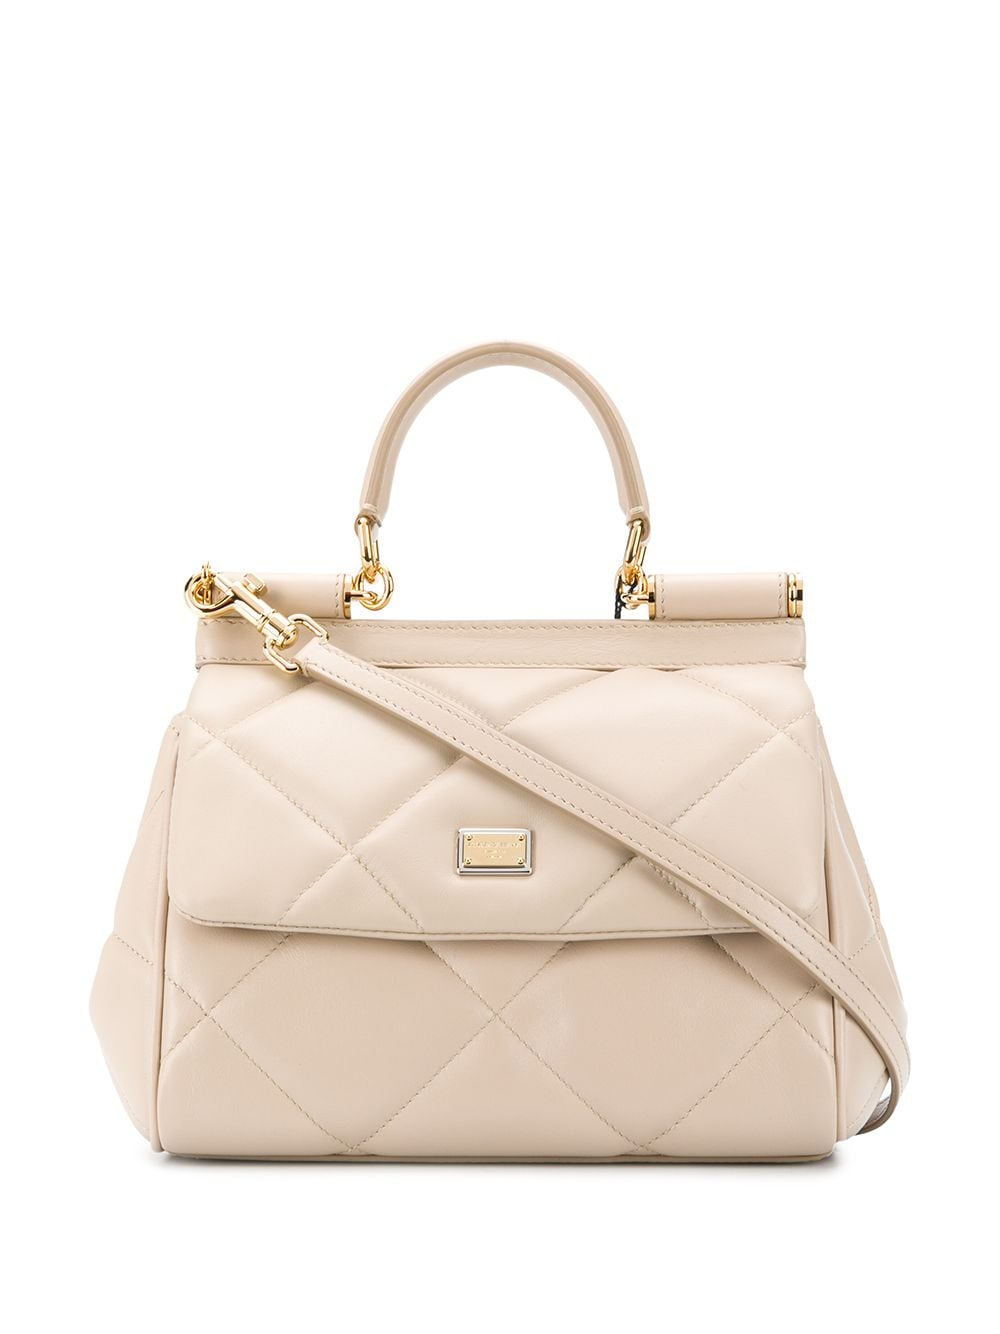 Sicily Small Leather Handbag